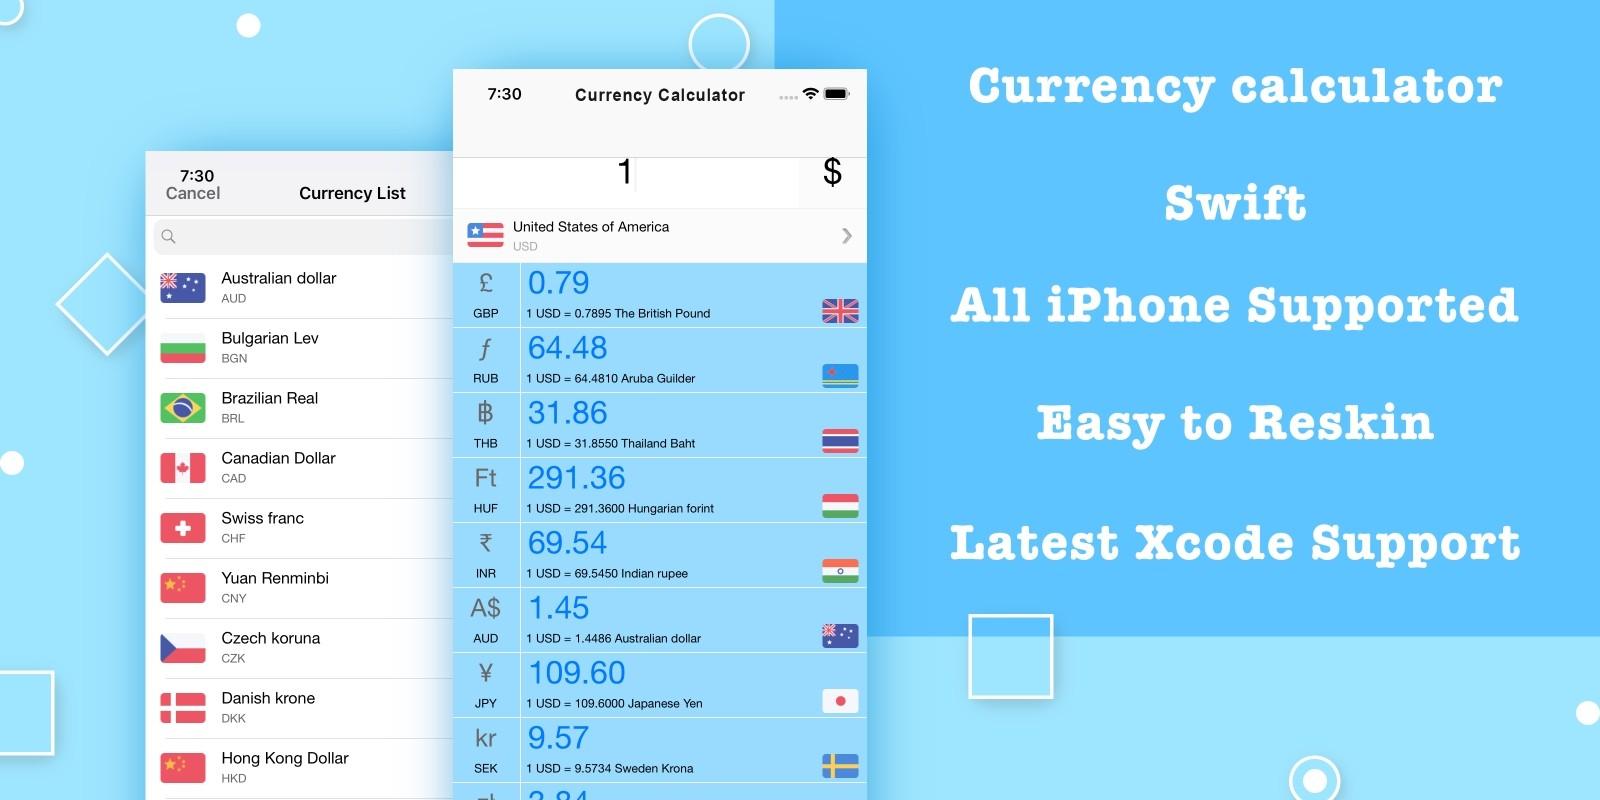 Currency Calculator - iOS Source Code